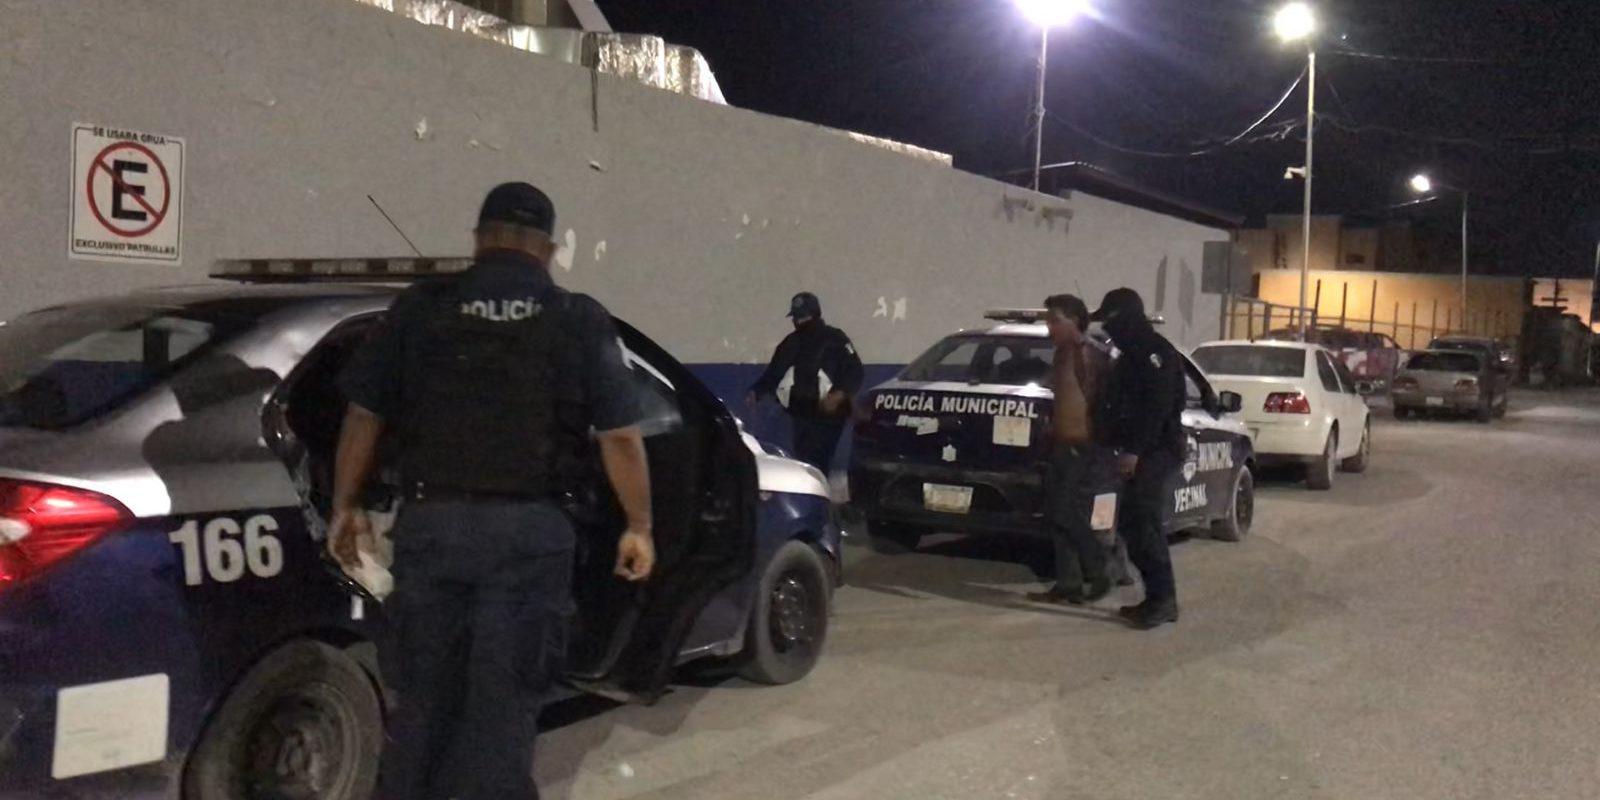 Echan a perder la fiesta, al provocar riña en colonia Leandro Valle de Monclova